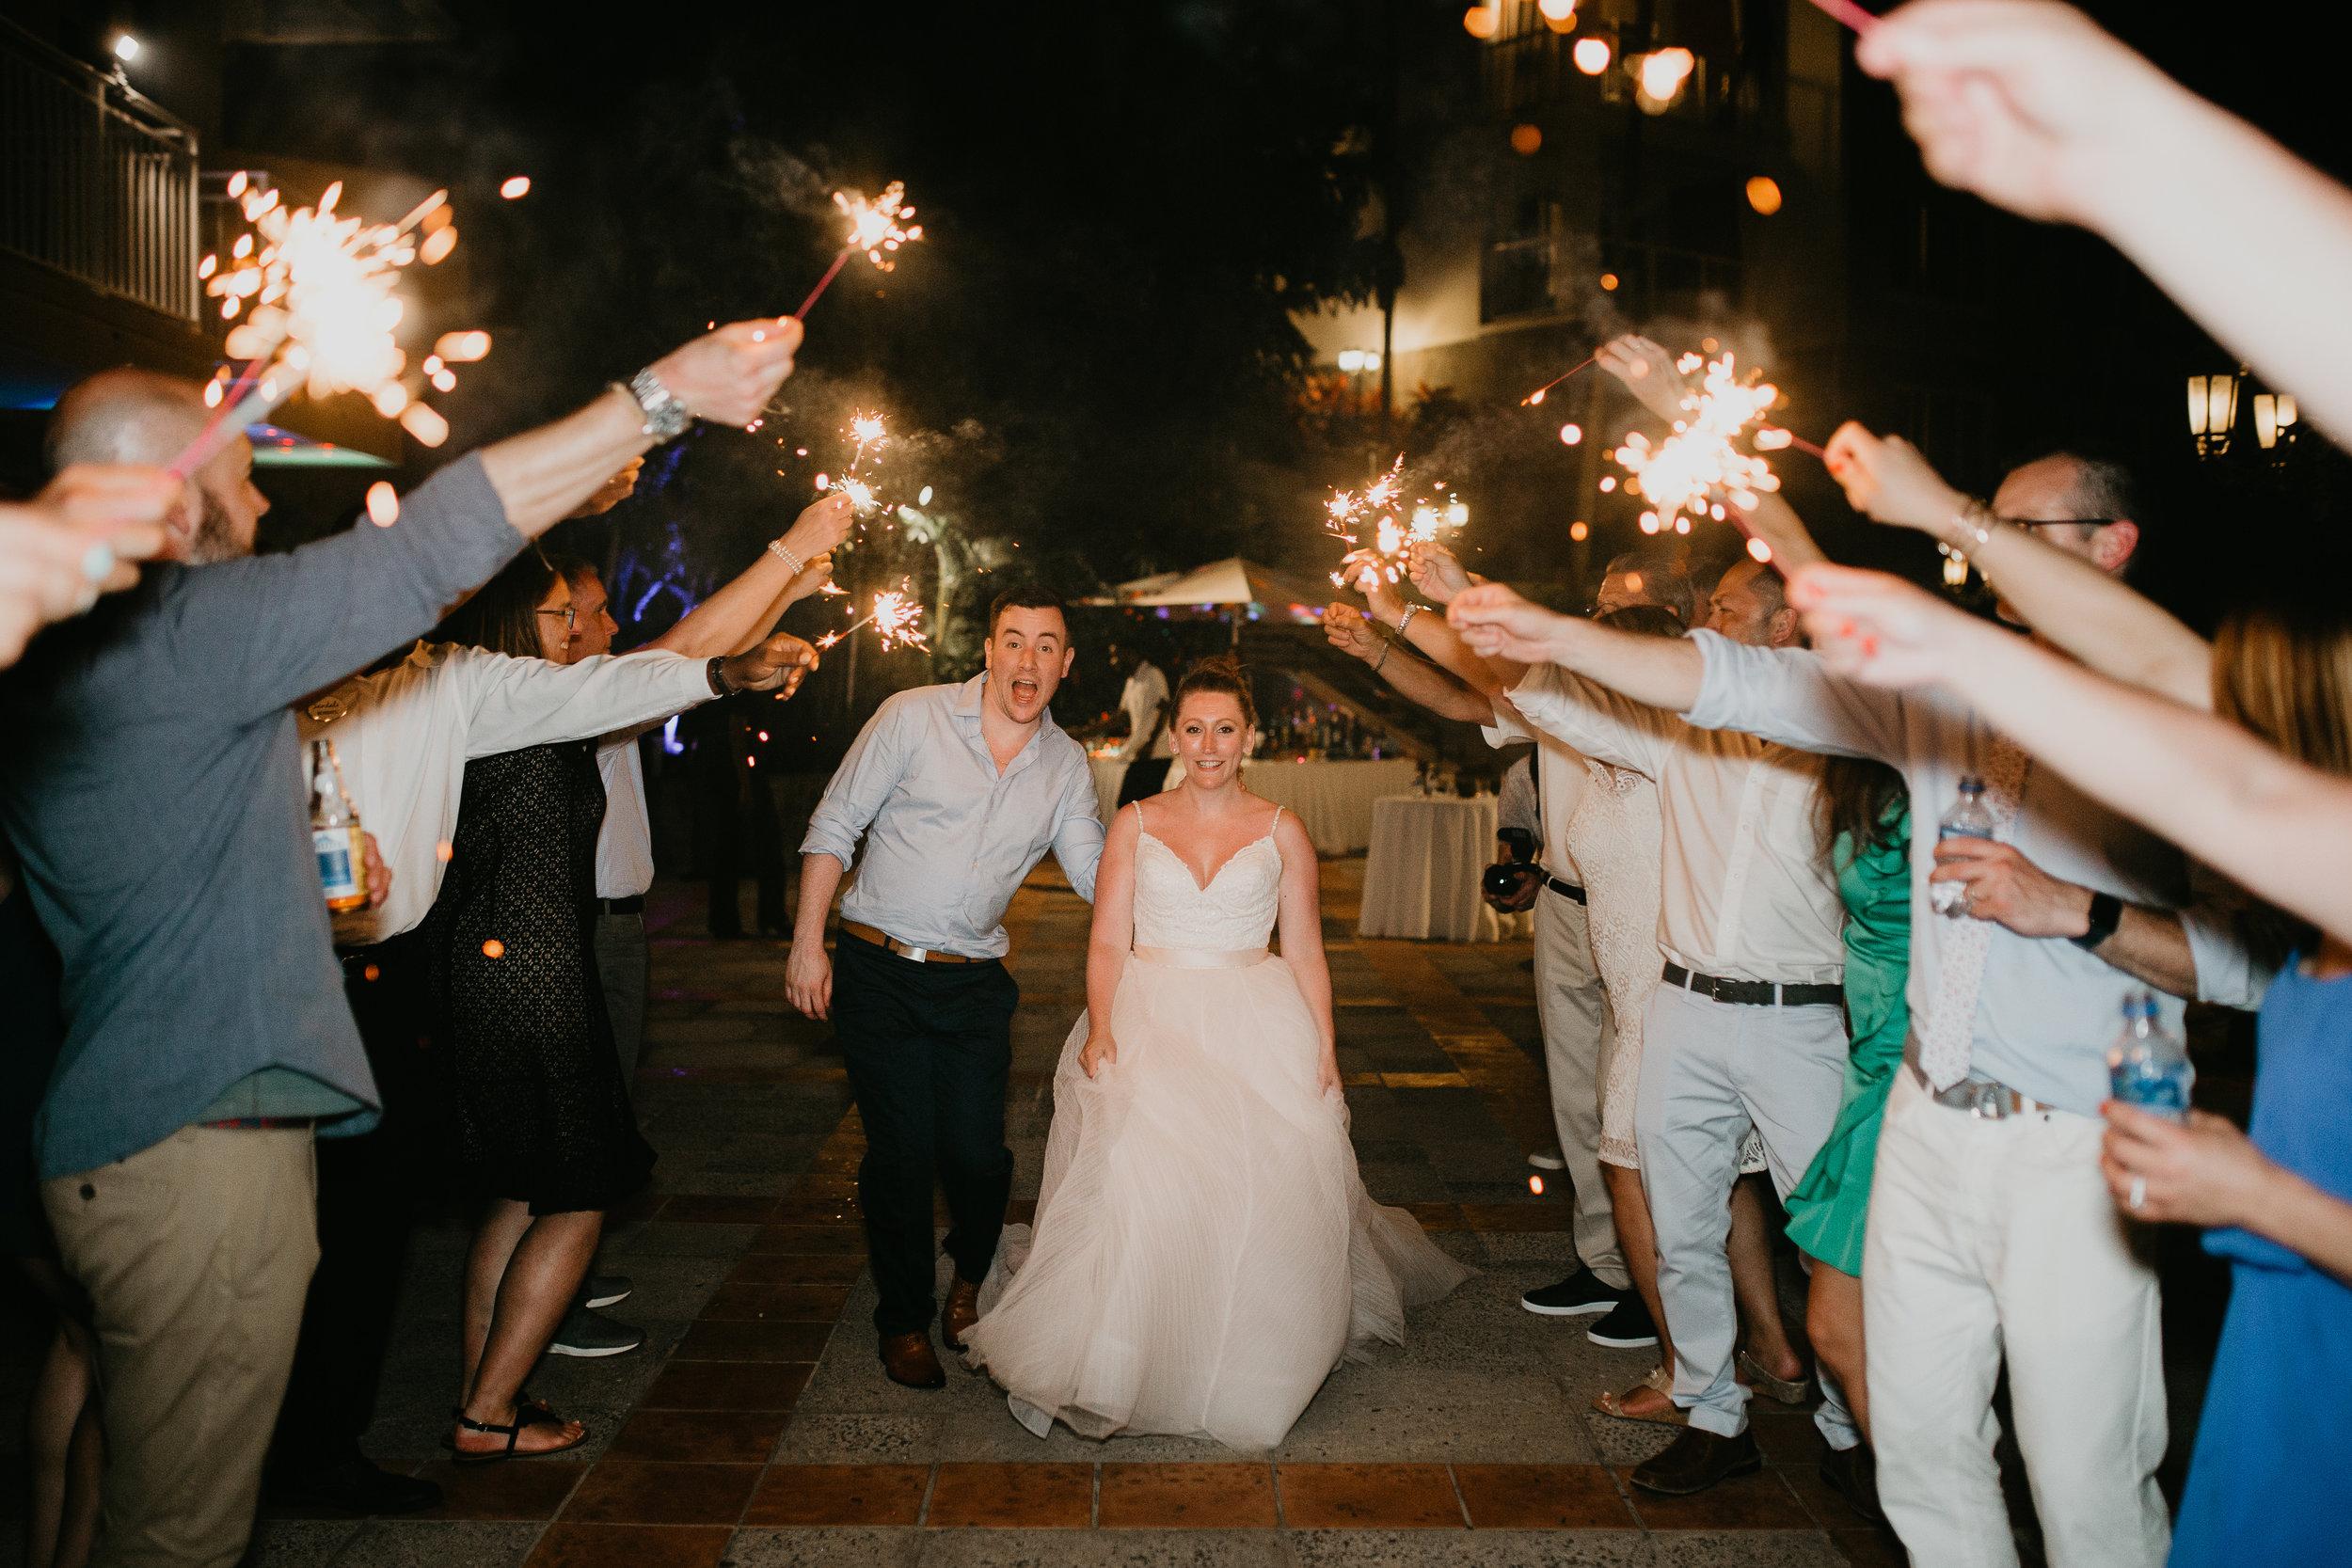 nicole-daacke-photography-destination-wedding-in-st-lucia-sandals-la-toc-intimate-island-wedding-carribean-elopement-photographer-chill-island-wedding-185.jpg